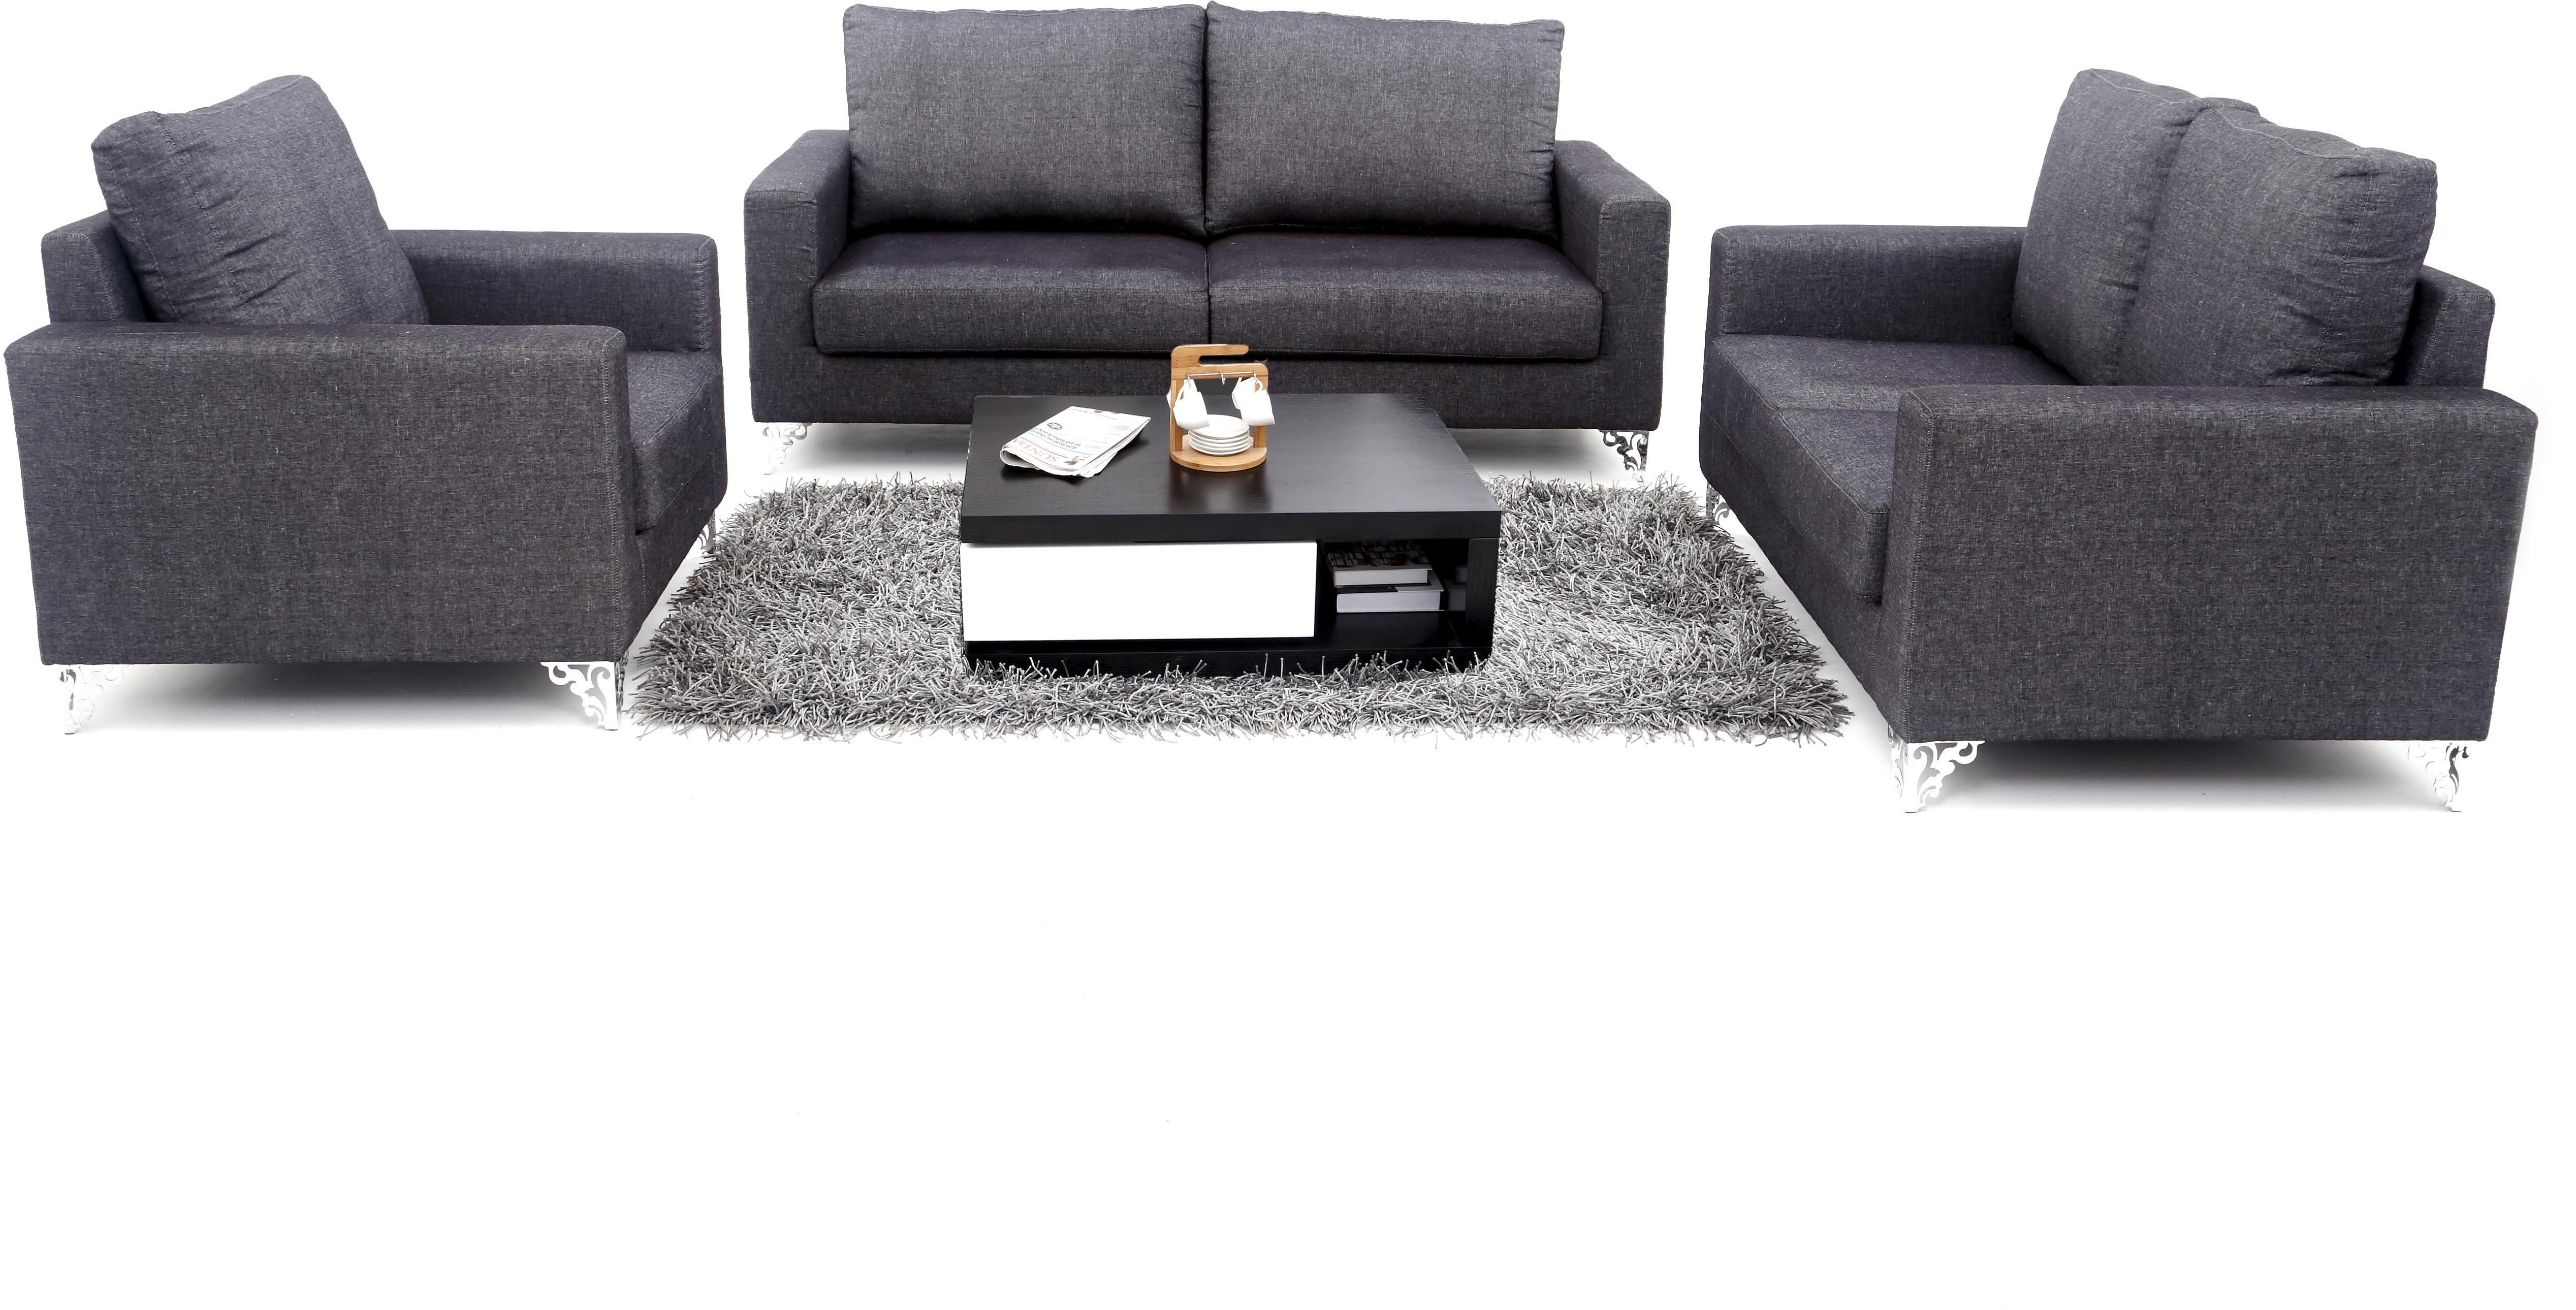 cheapest sofa set in chennai leather manufacturer furnicity fabric 3 43 2 1 furniture price